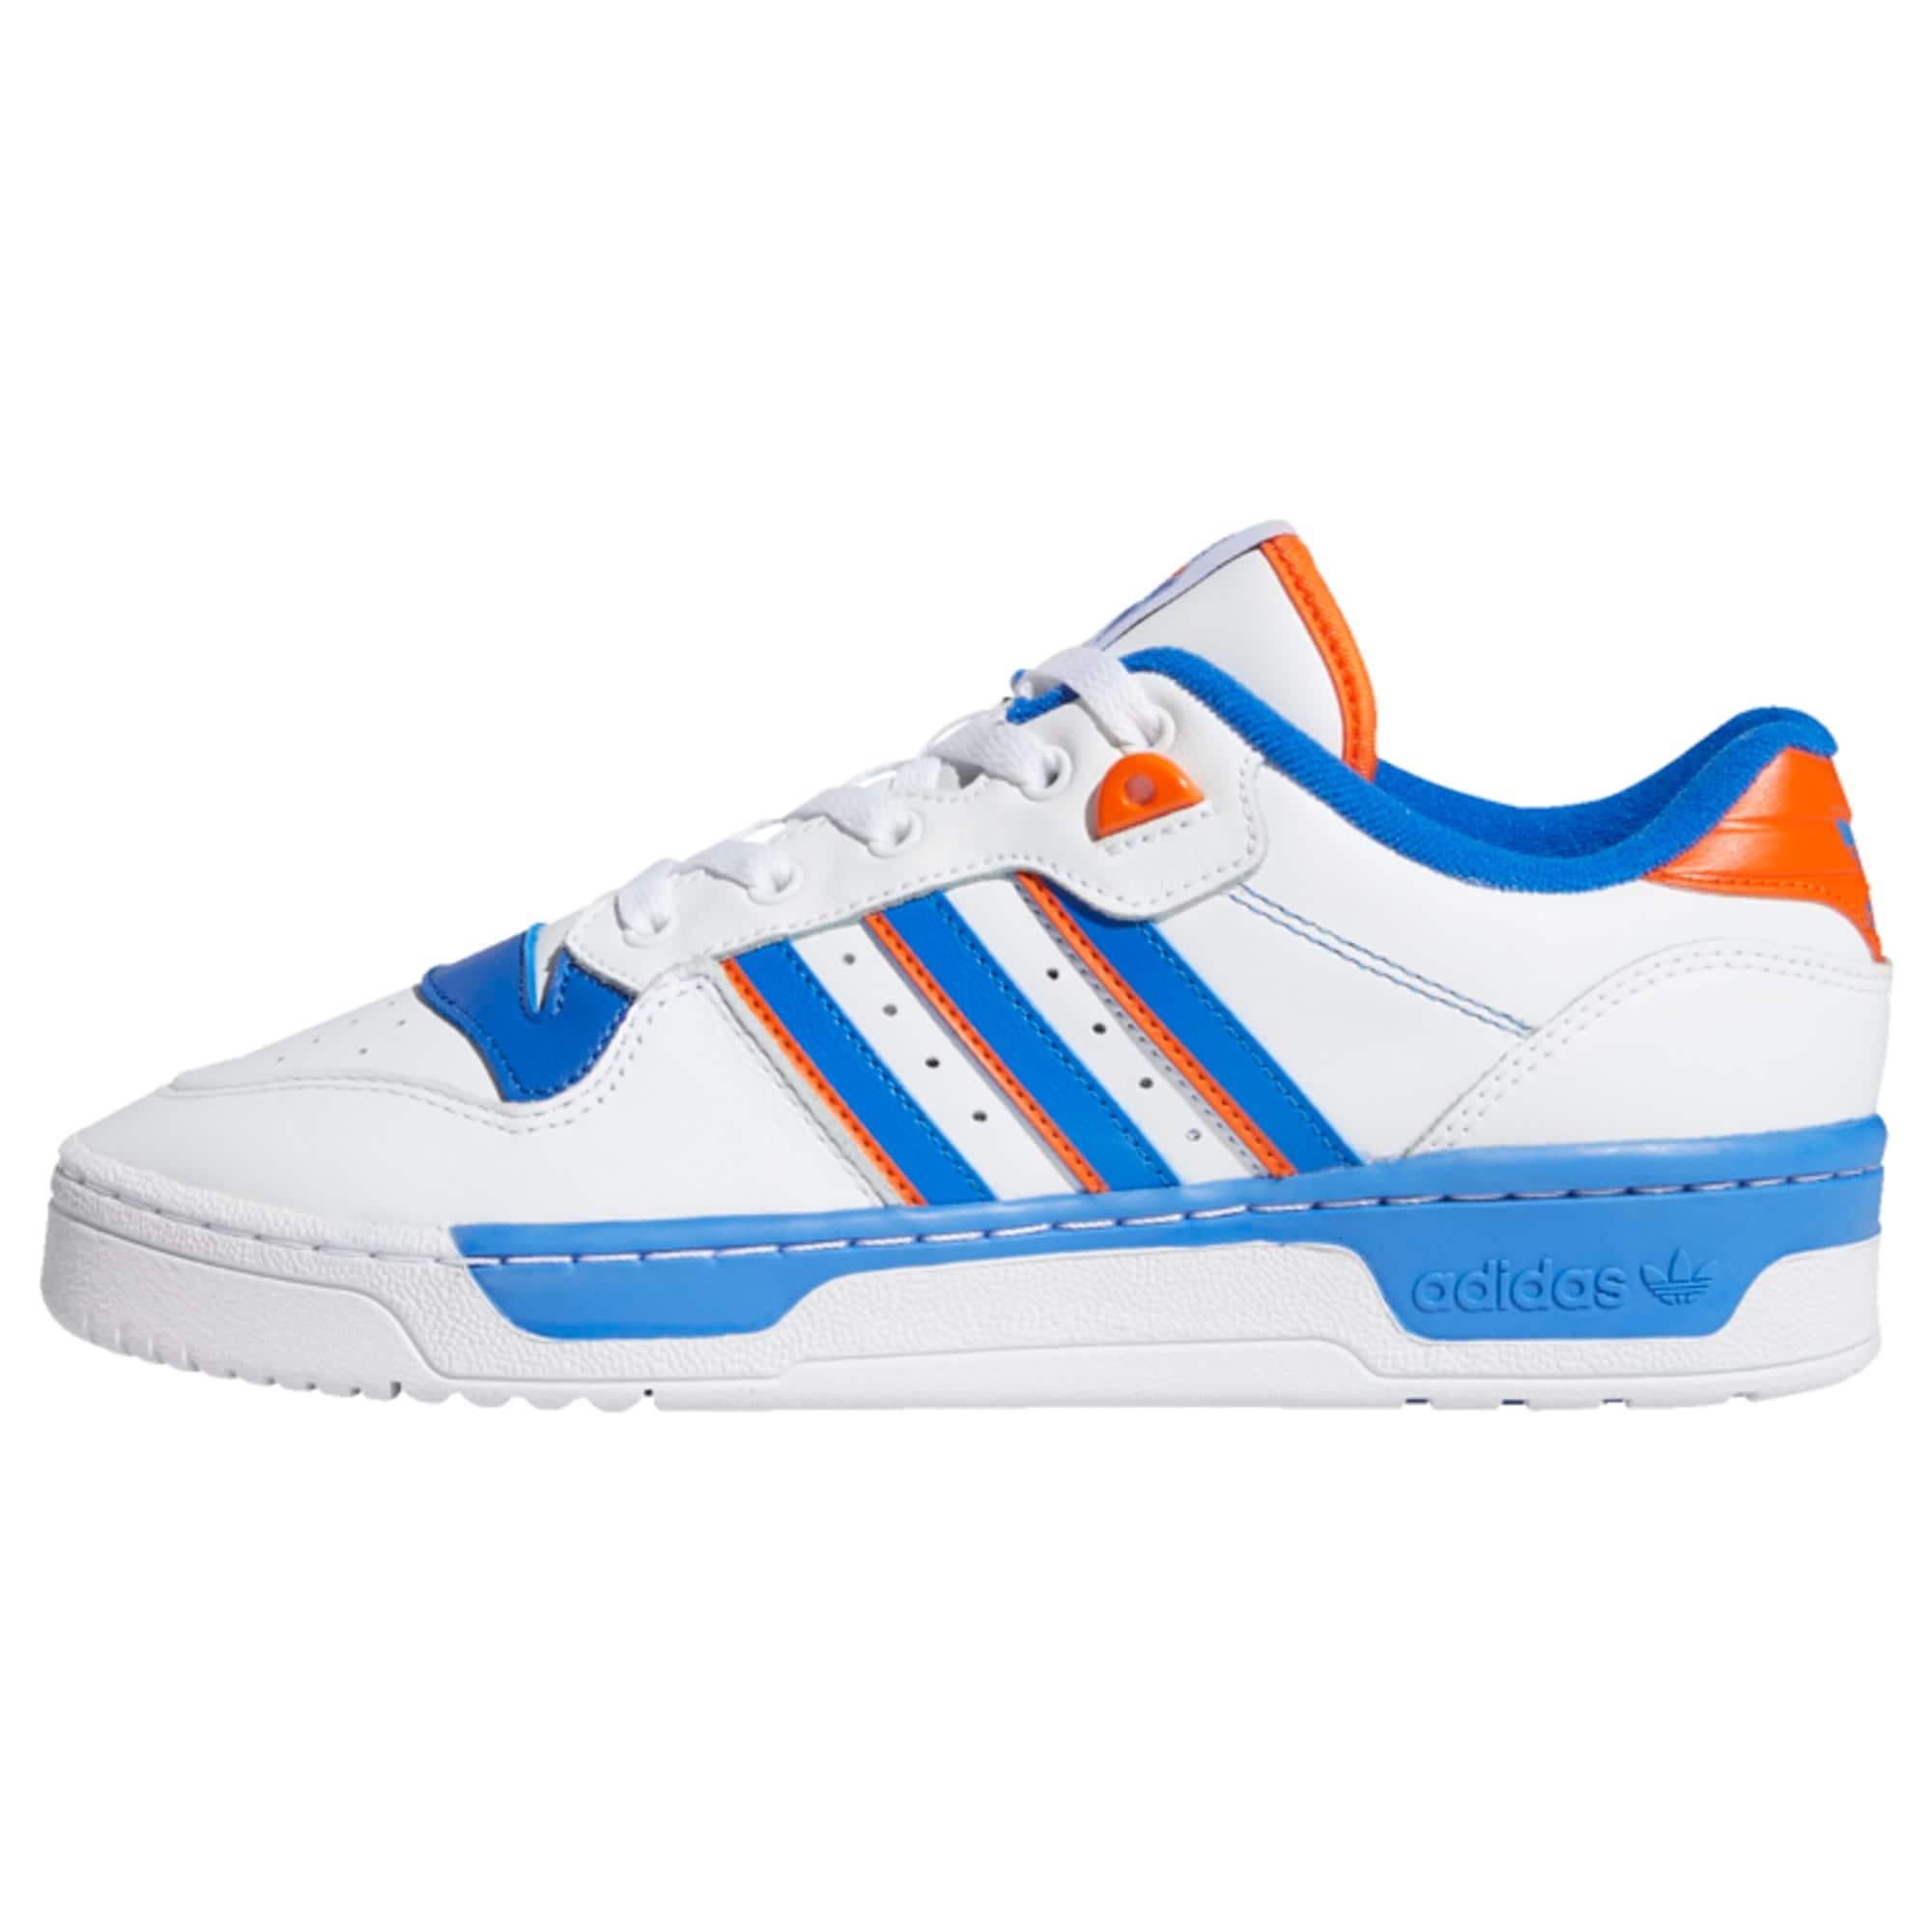 ADIDAS ORIGINALS Tenisky  bílá / modrá